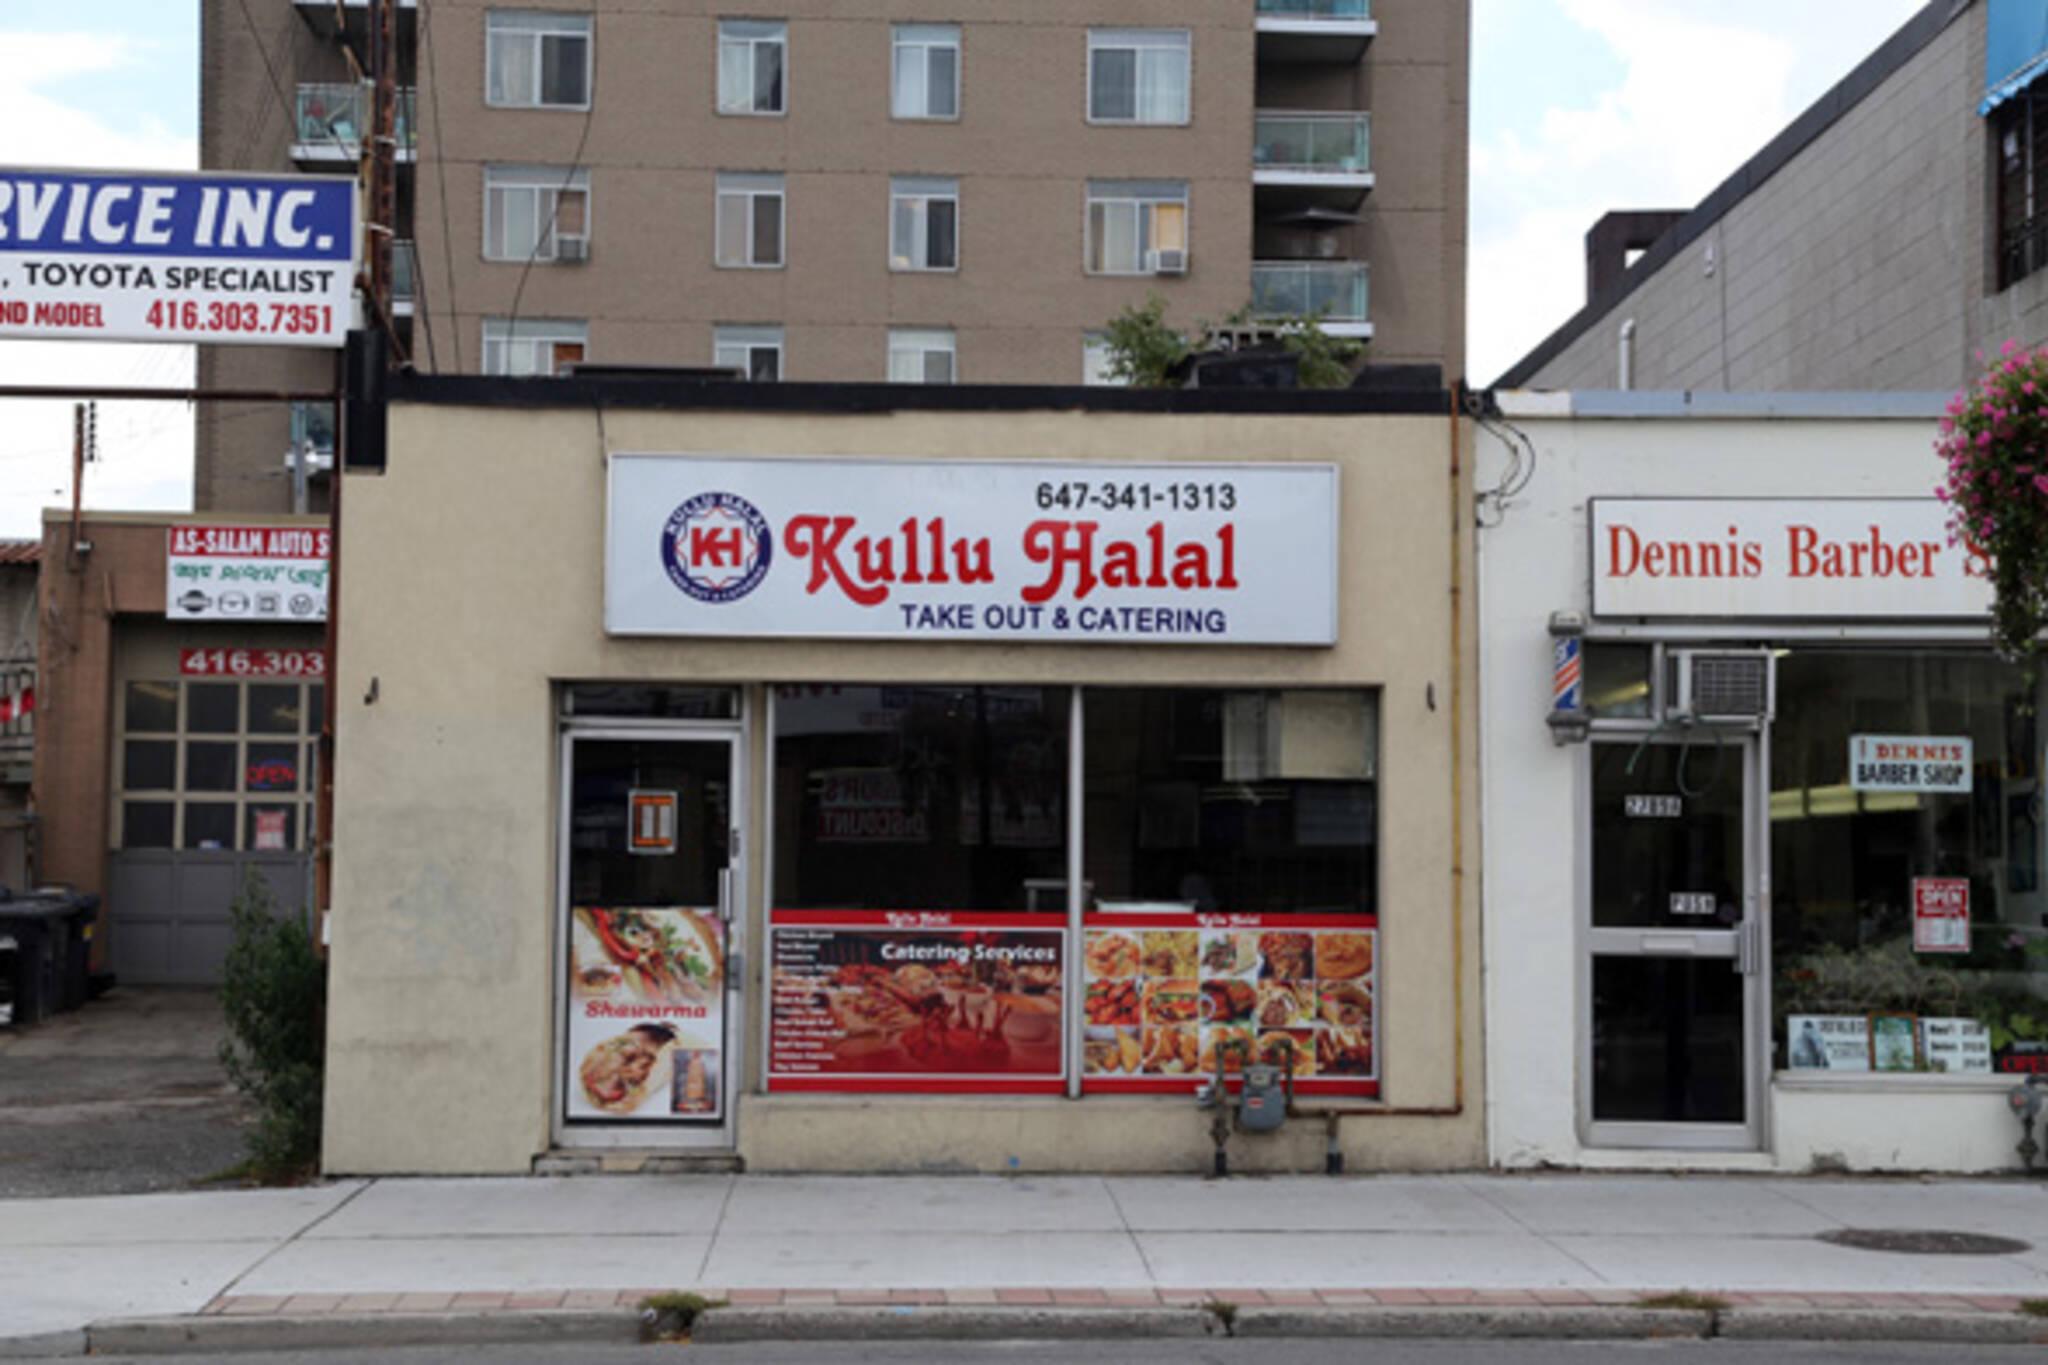 Kullu Halal